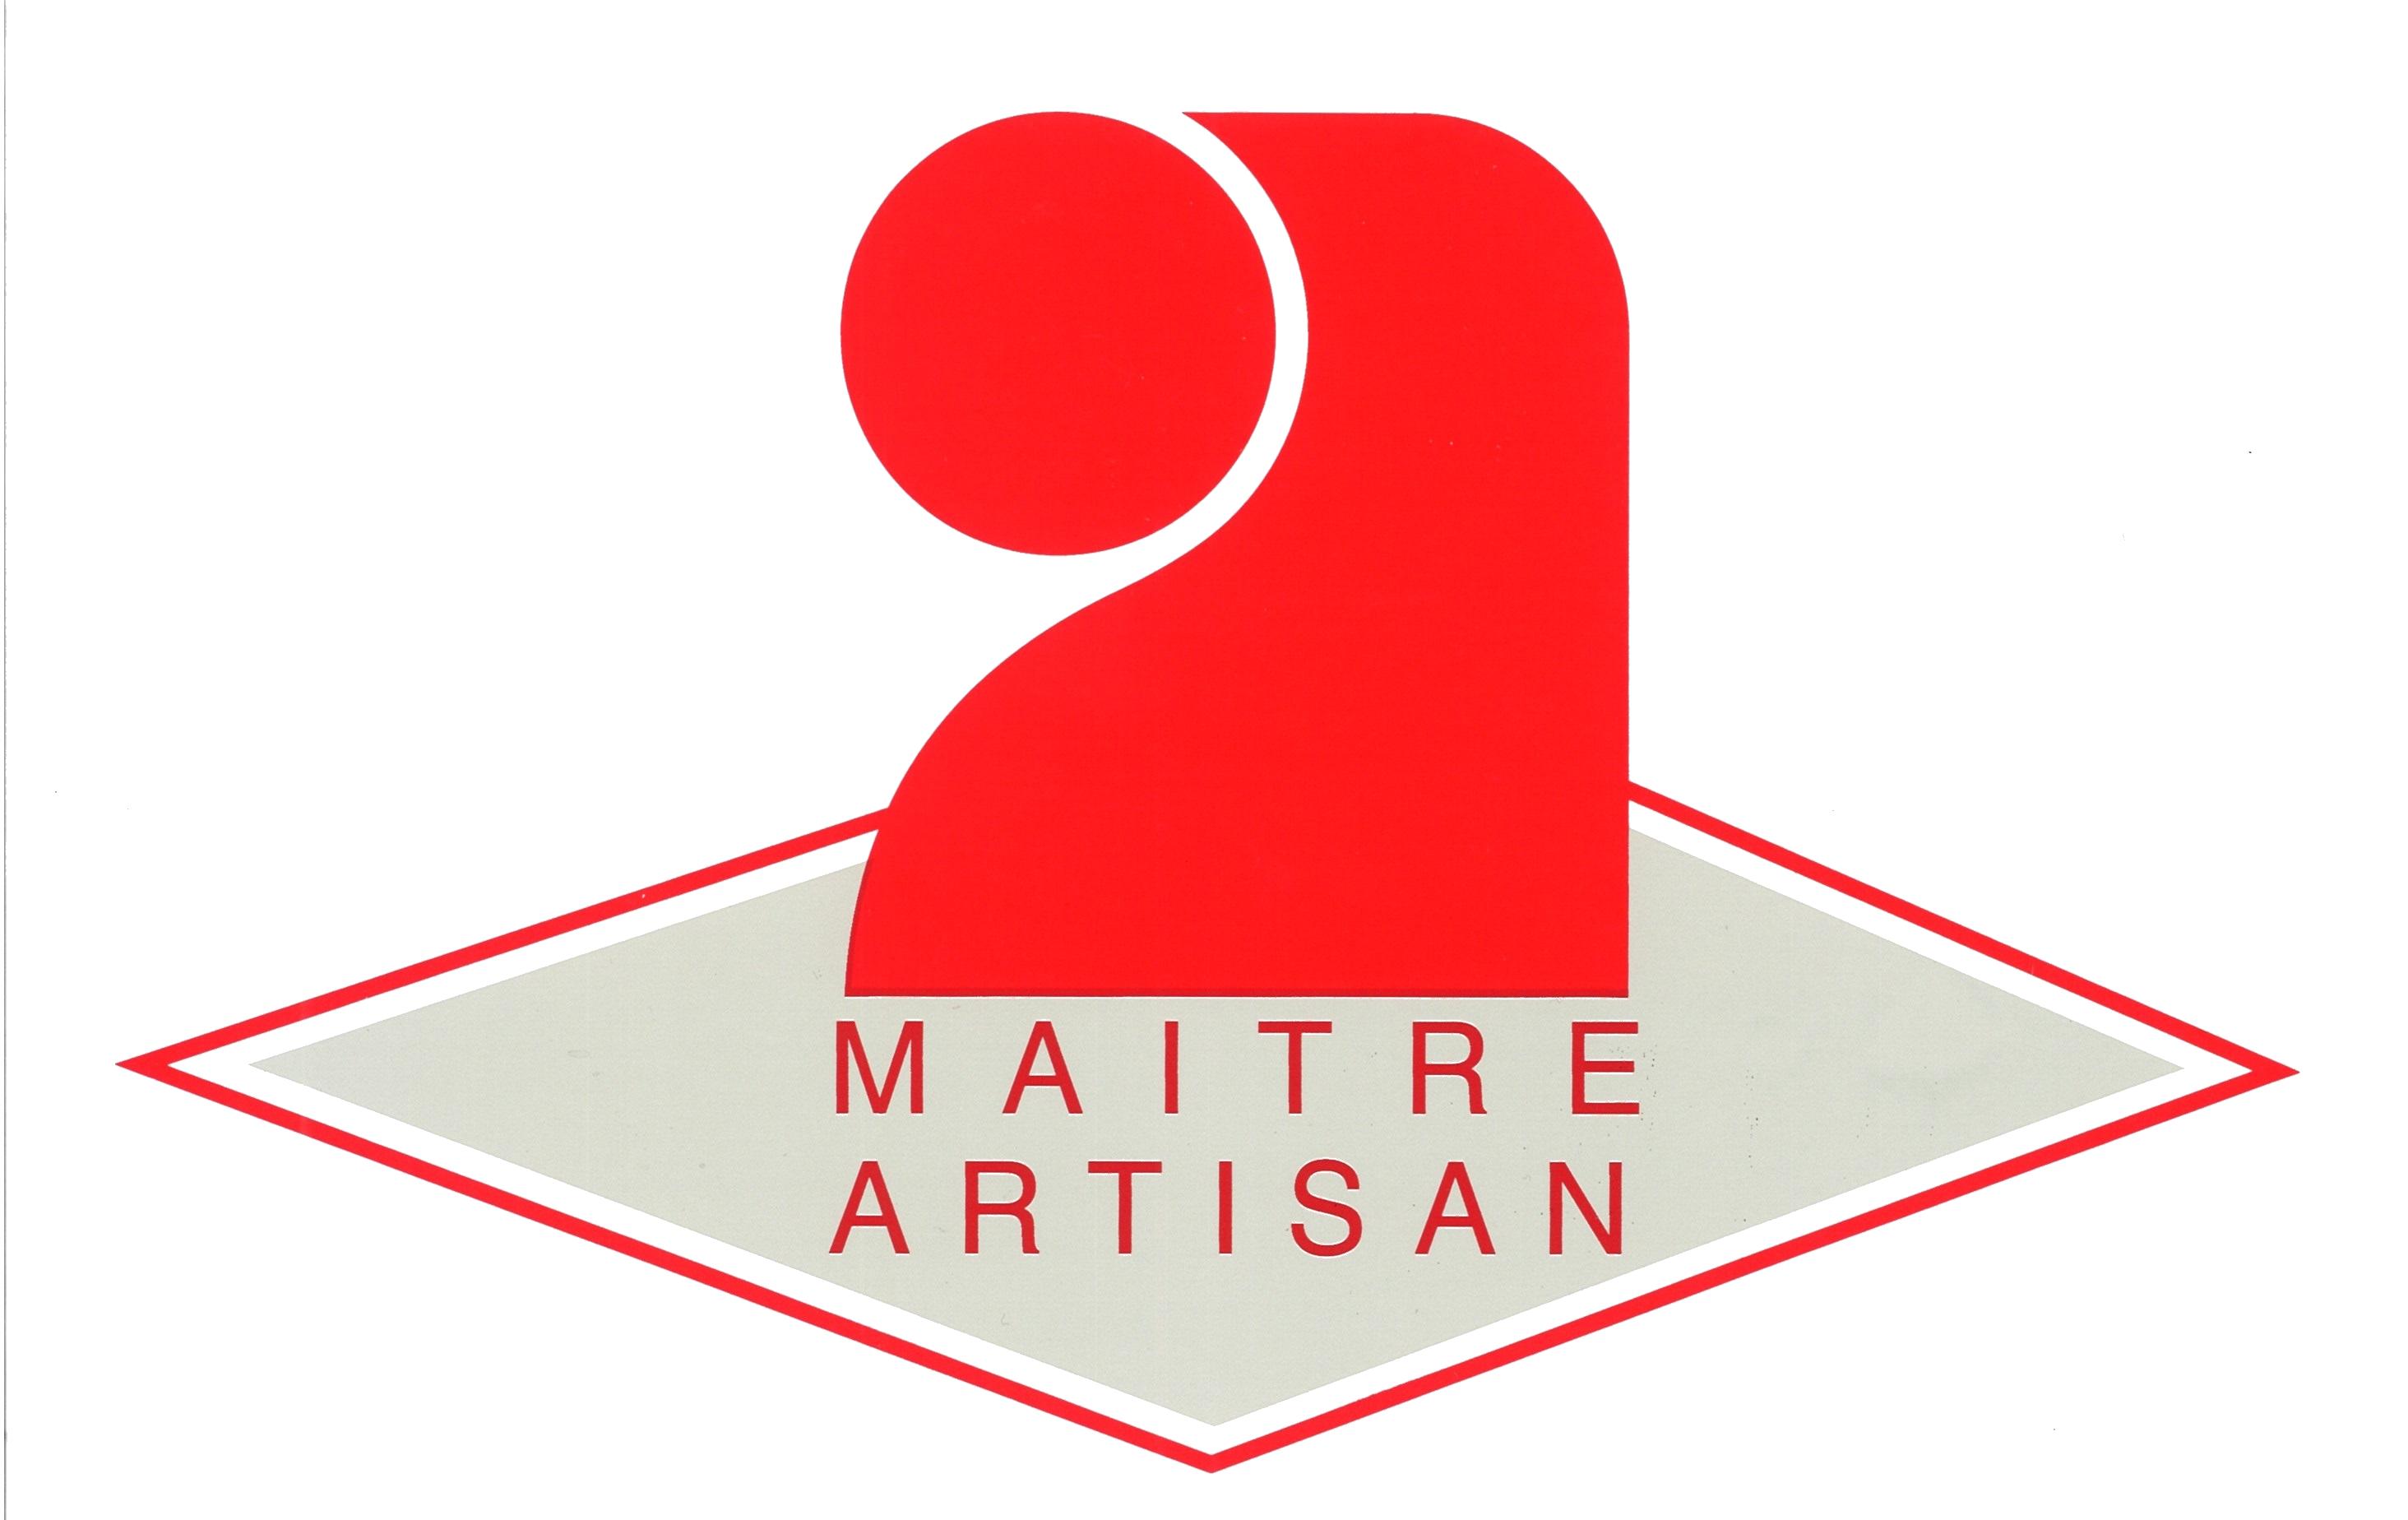 Maître Artisan